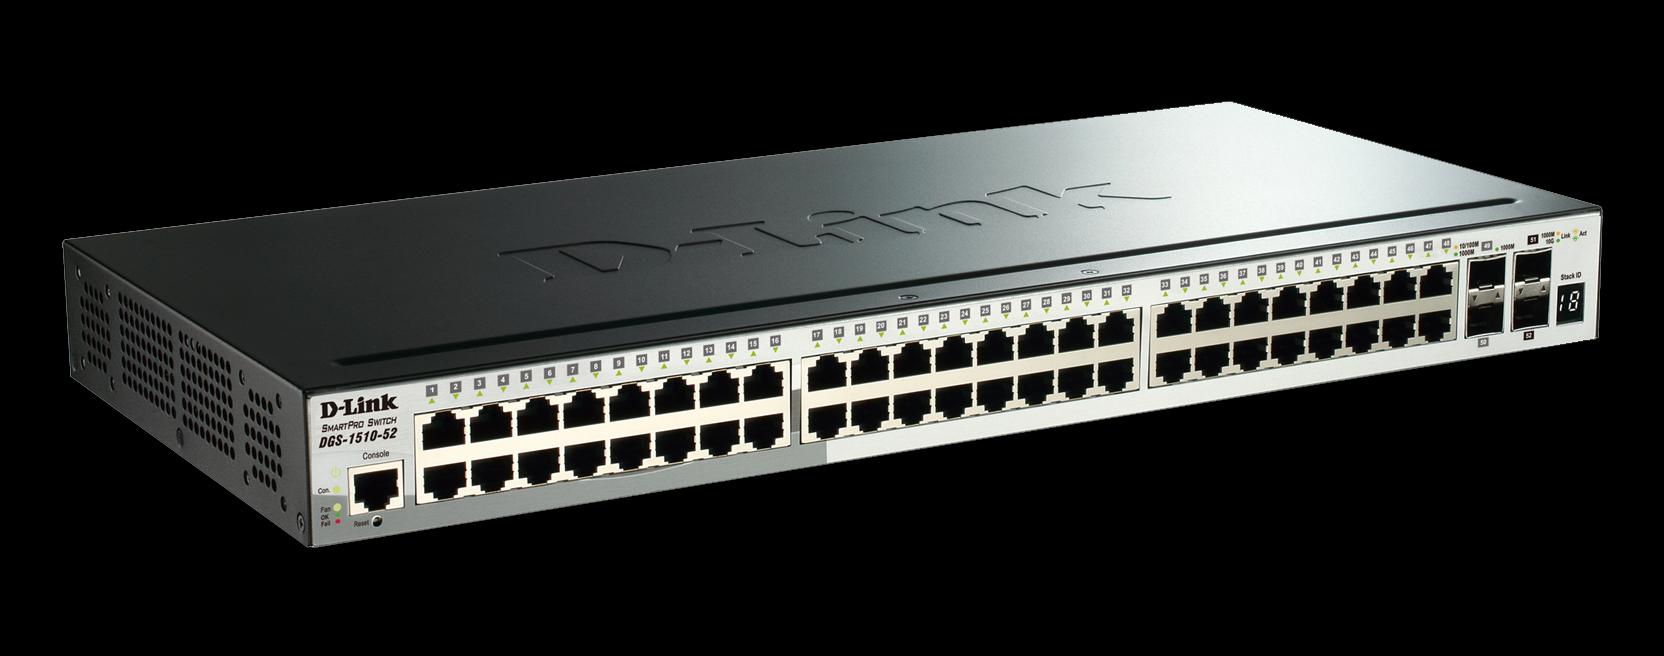 D-Link DGS-1510-52 52-Port Gigabit Stackable Smart Managed Switch including 2 10G SFP+ and 2 SFP ports (smart fans)